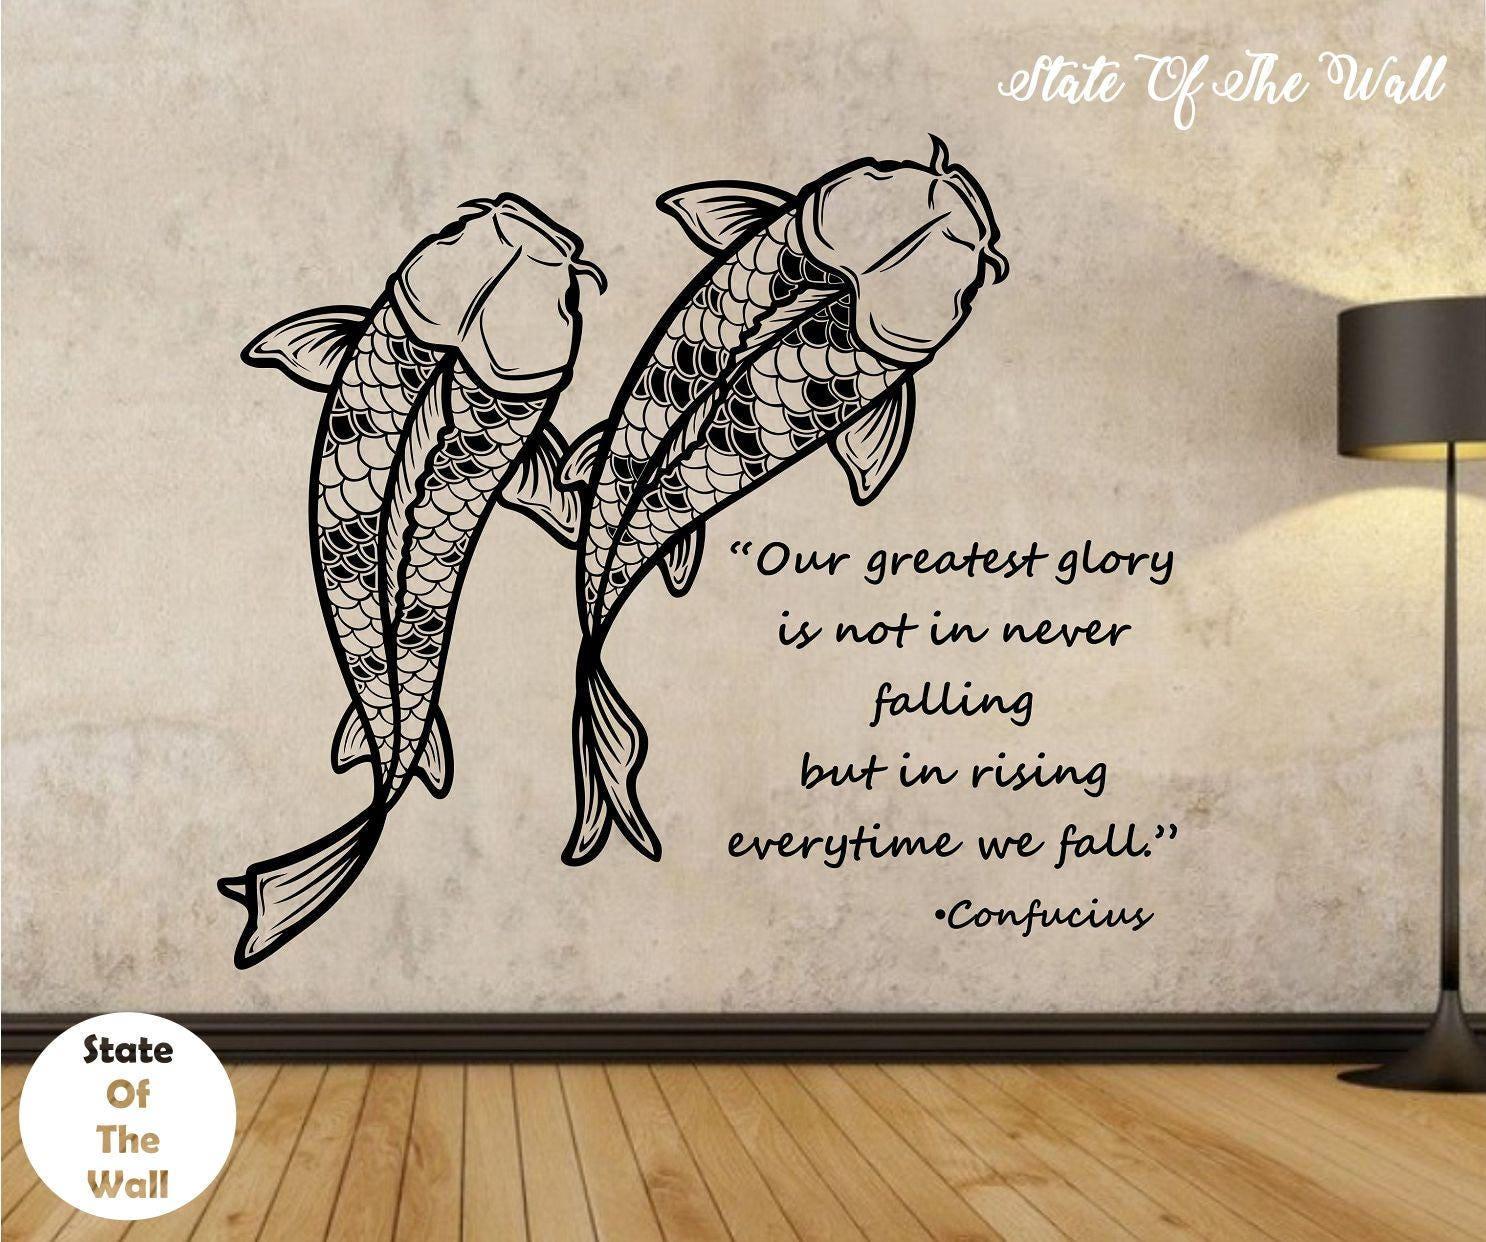 koi fish wall decal confucius quote sticker art decor bedroom zoom